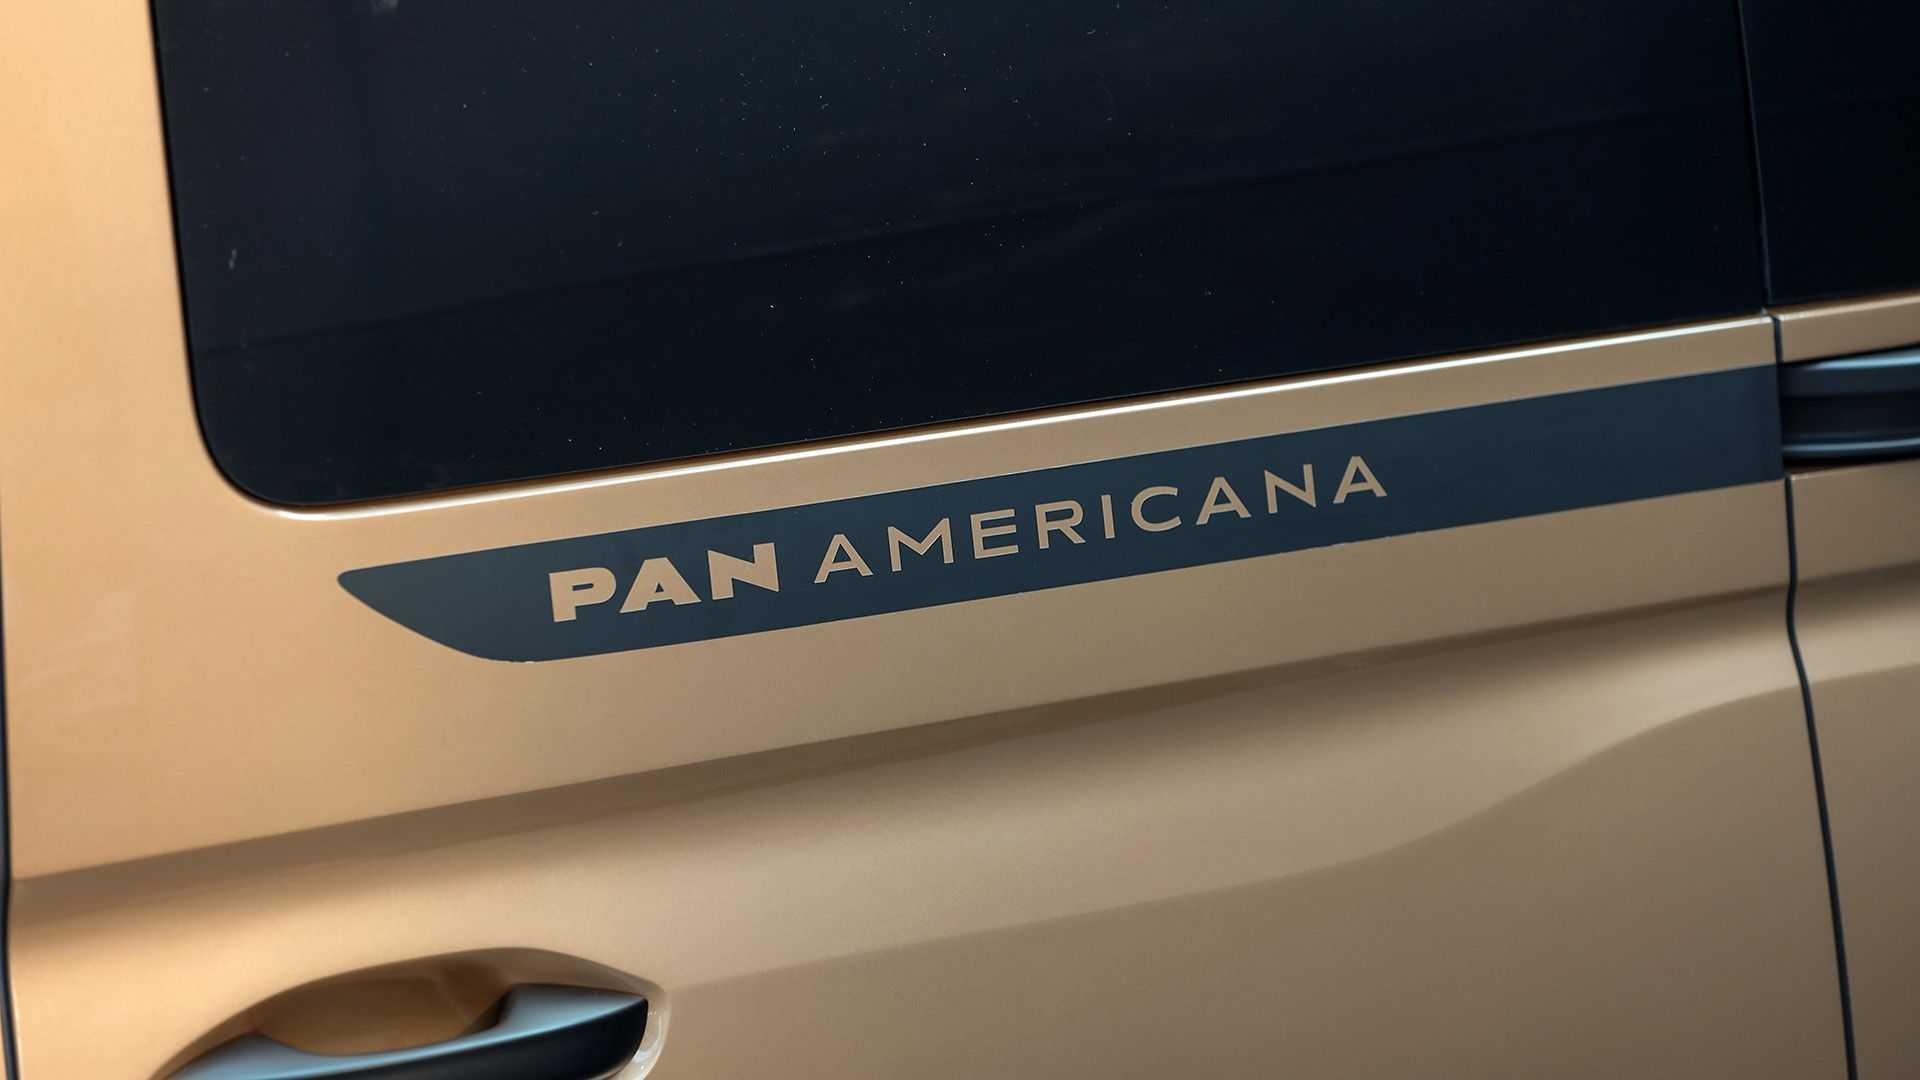 vw-caddy-panamericana-20215.jpeg